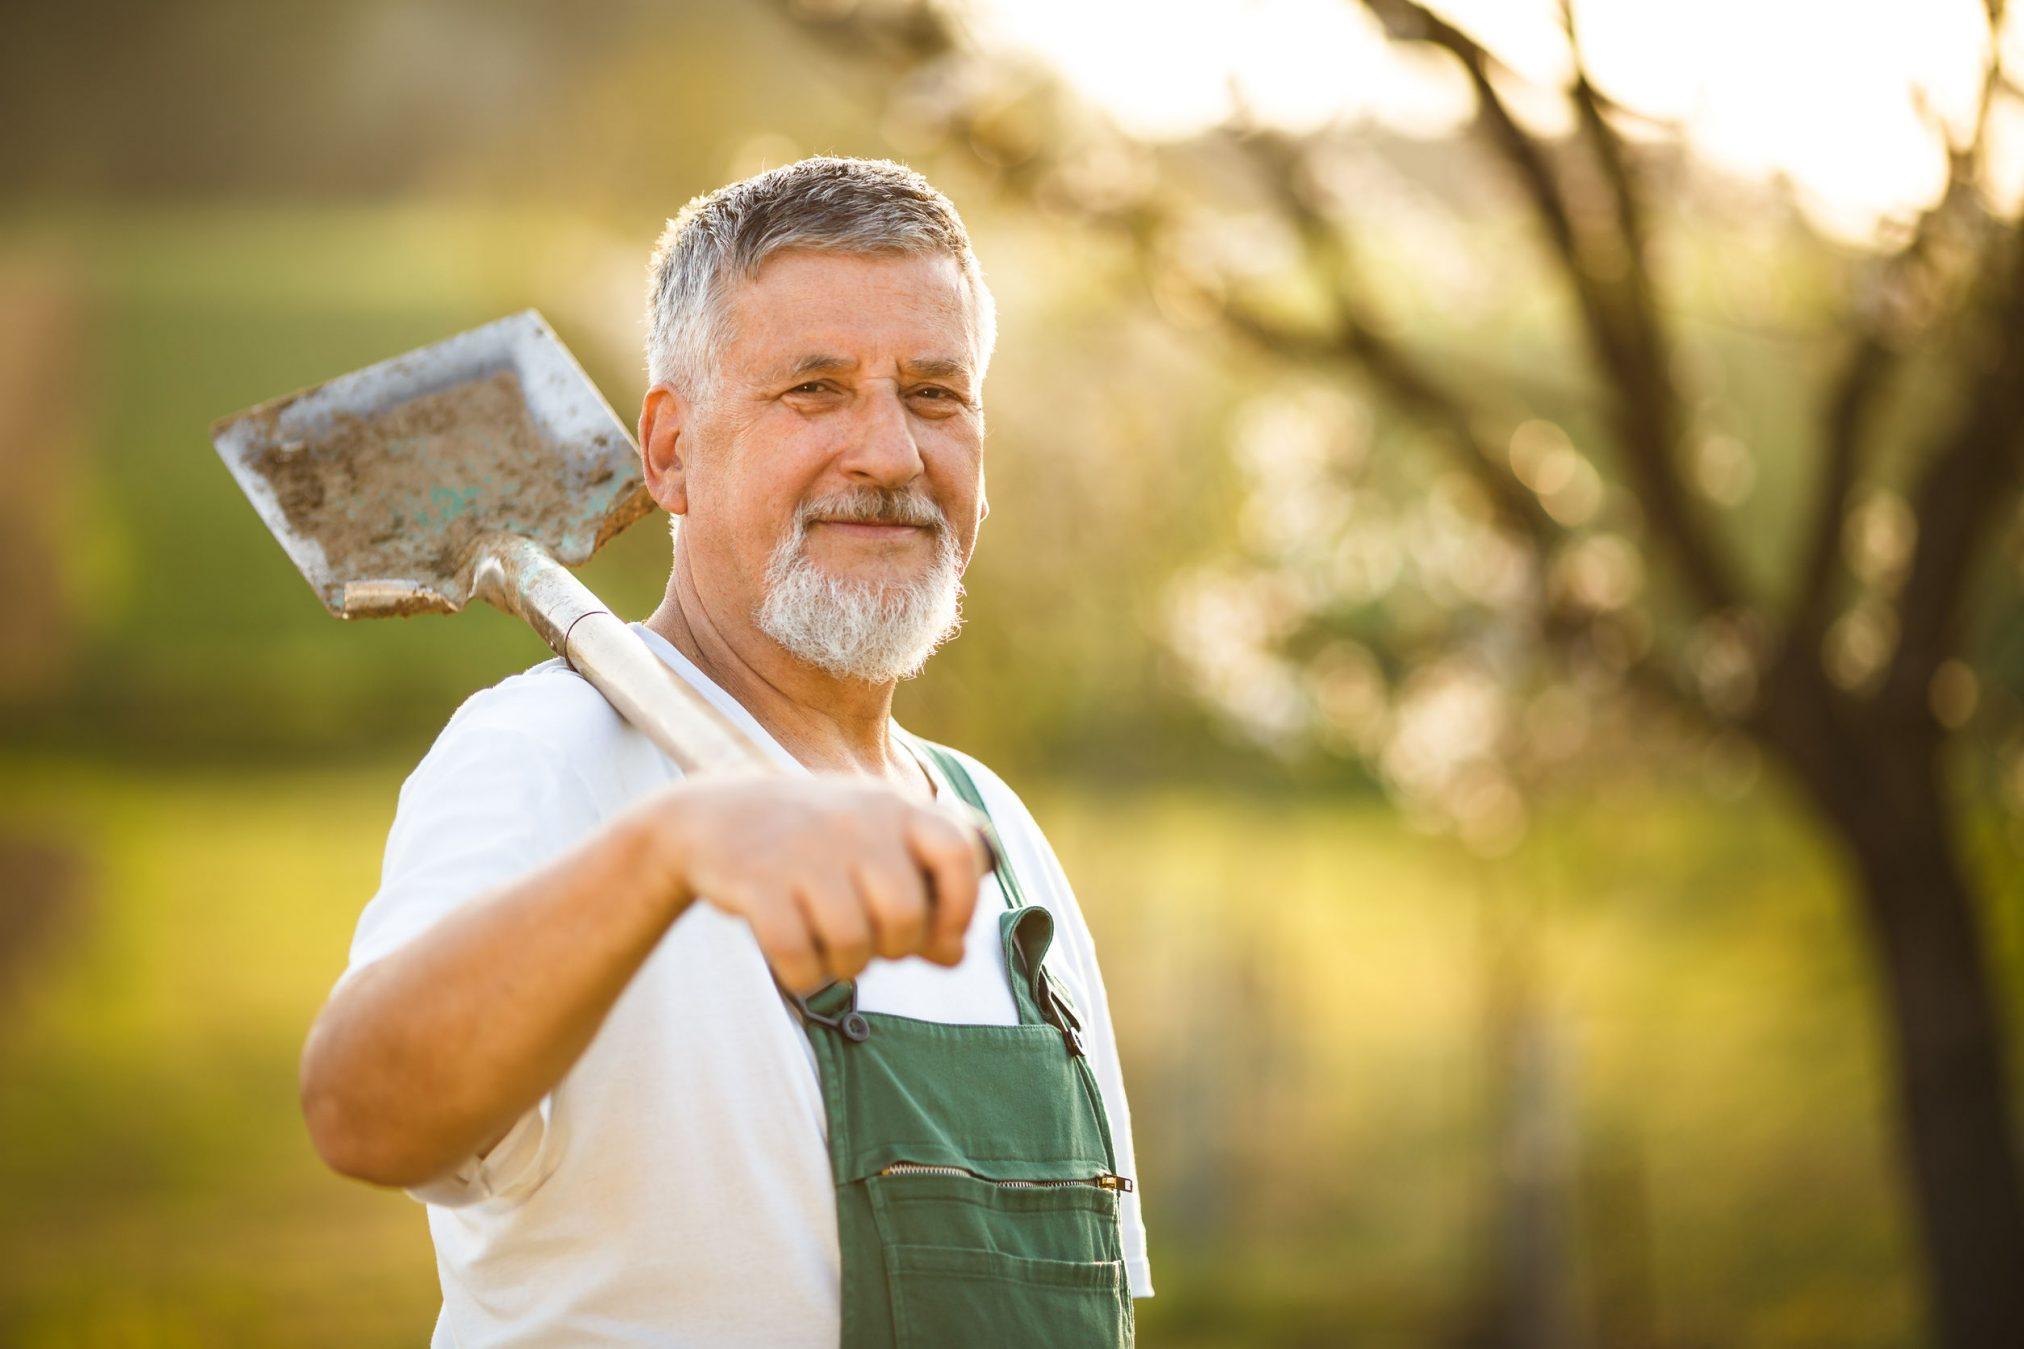 happy older man in garden with shovel